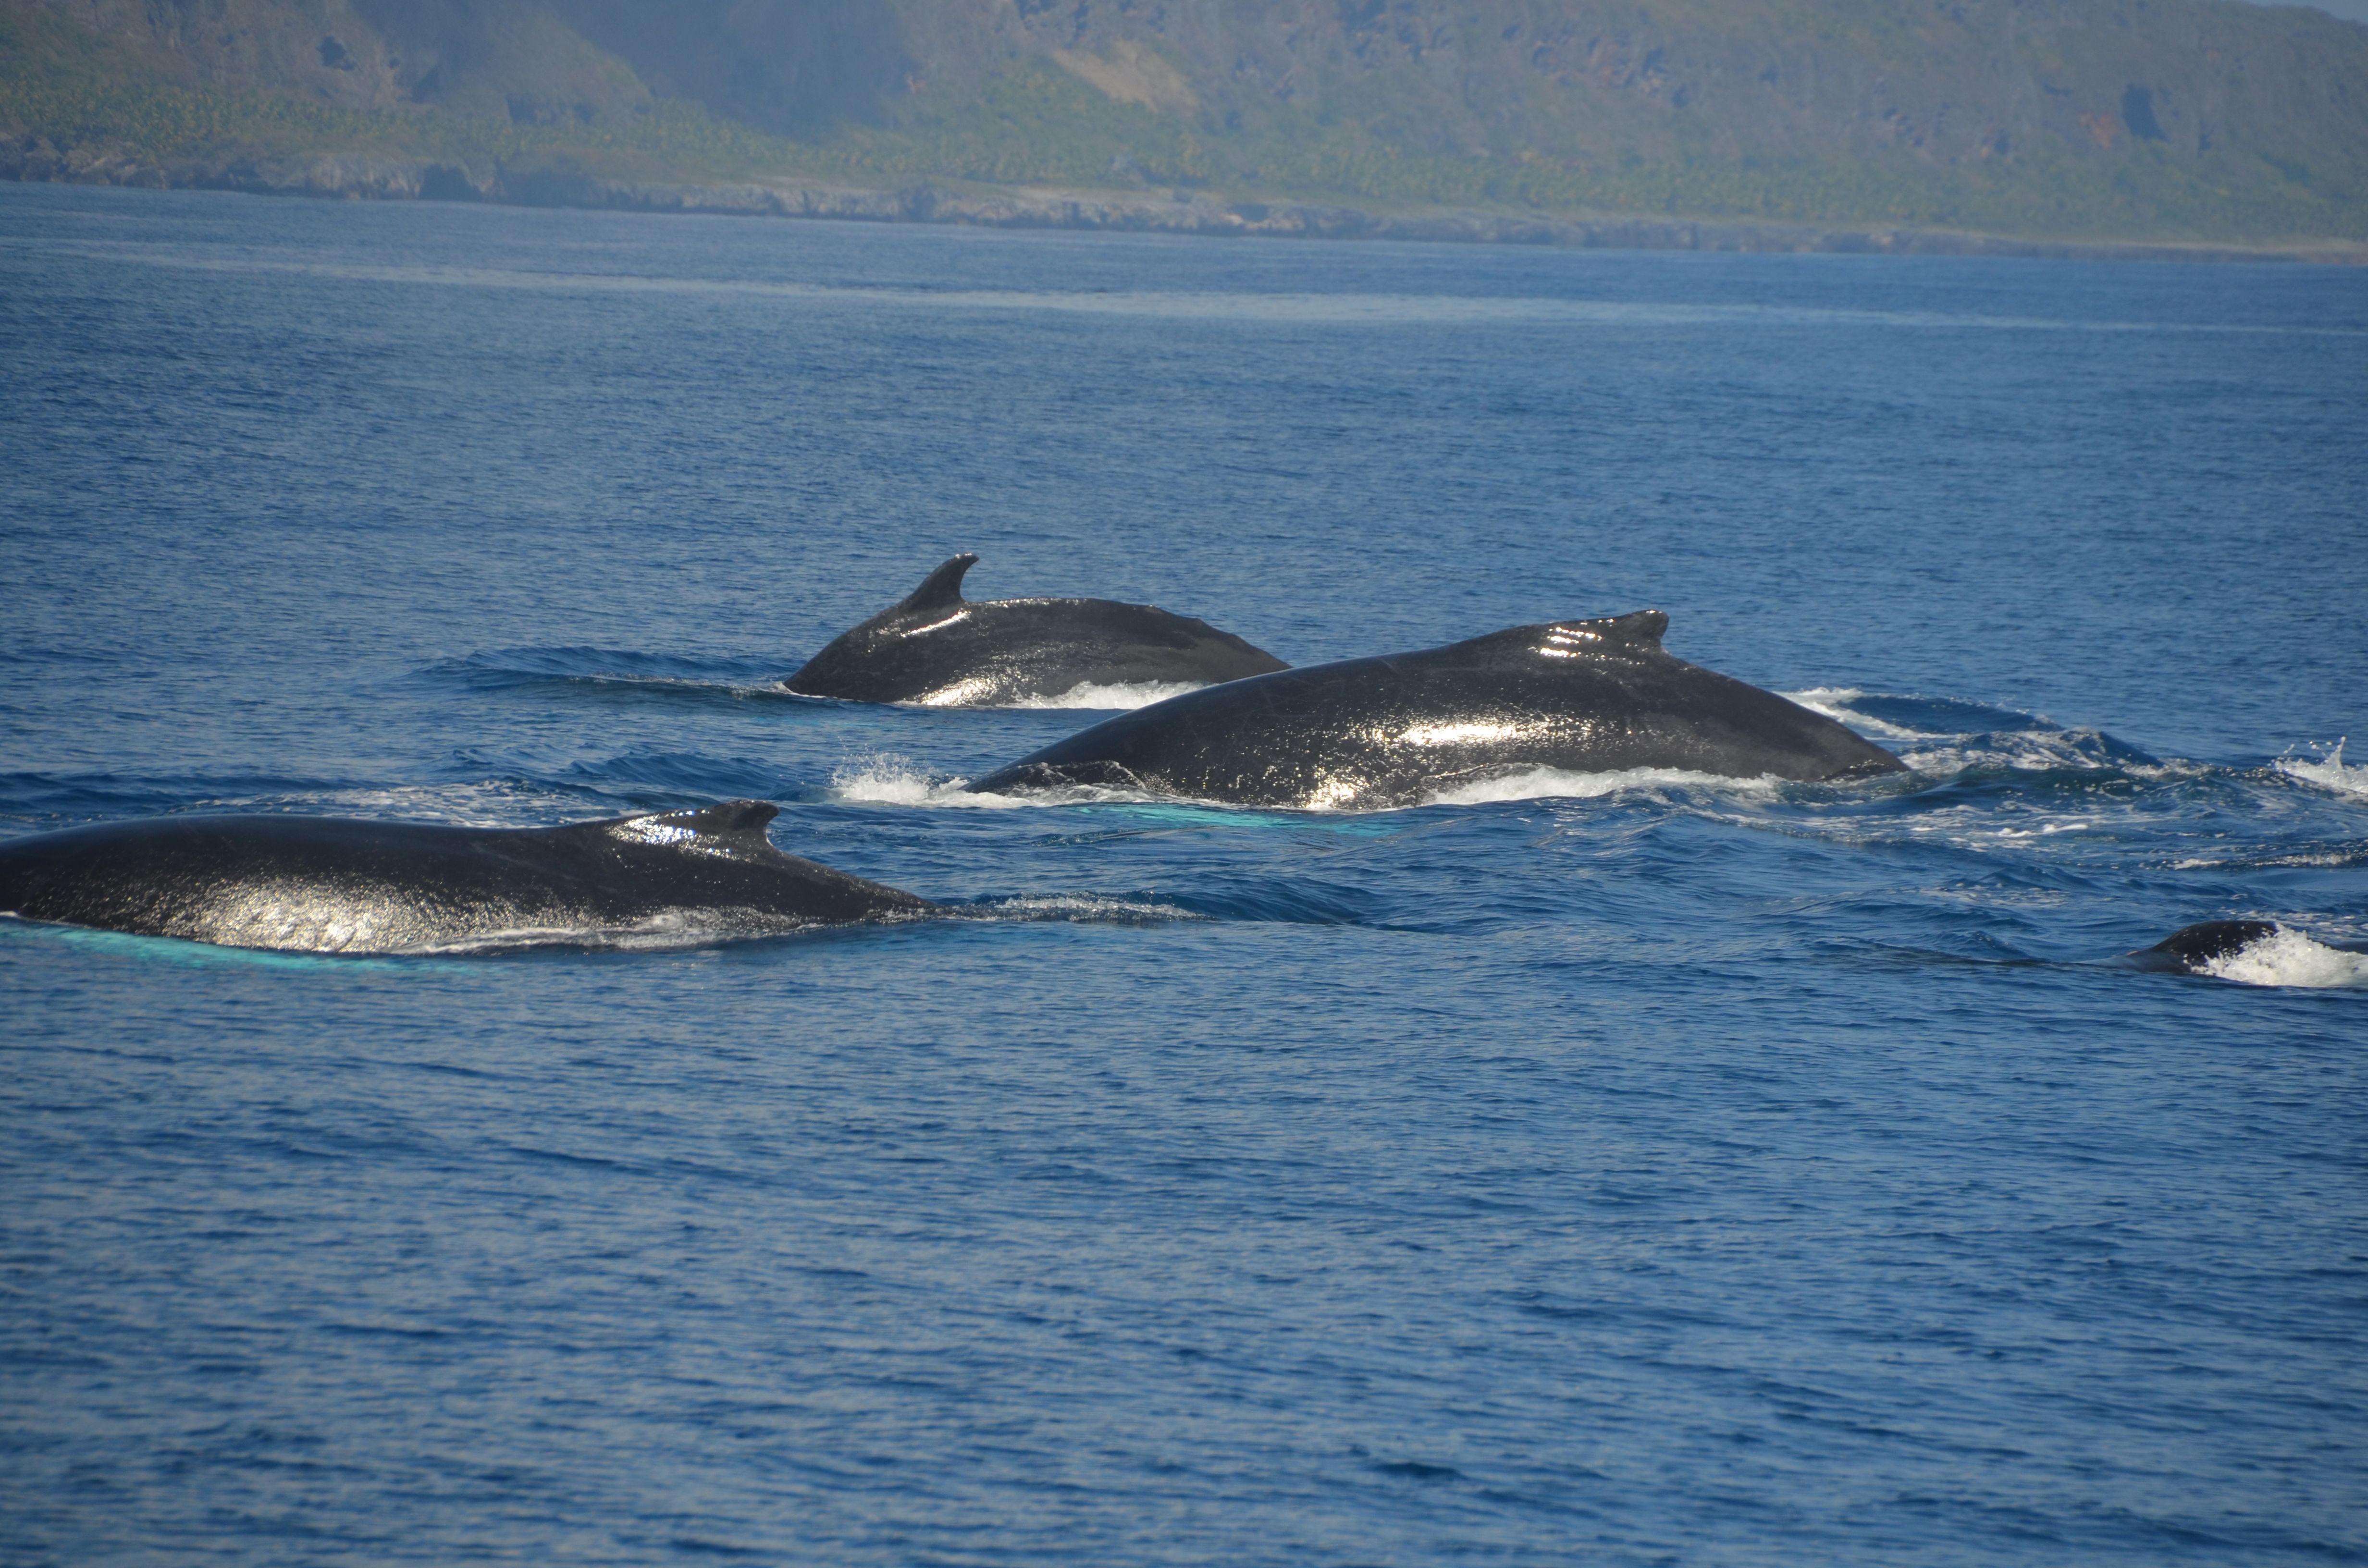 Humpback Whales Samaná Dominican Republic 2014 Whale Humpback Whale Samana